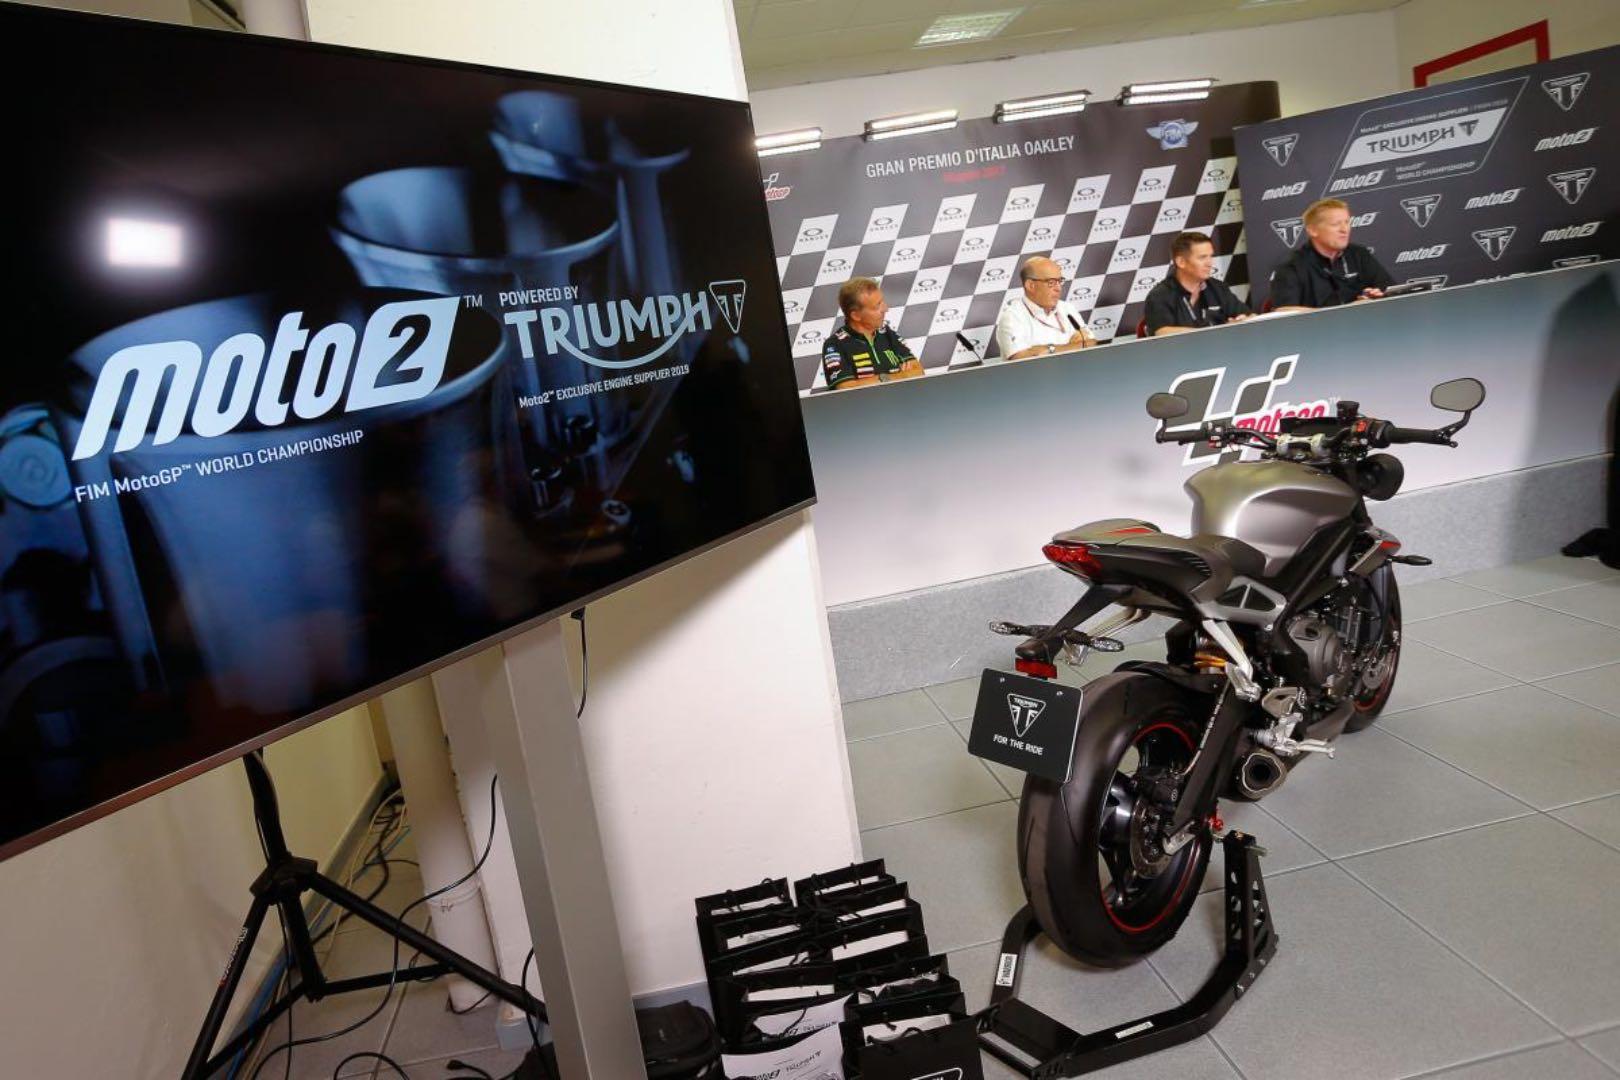 Triumph Official Moto2 Engine Supplier